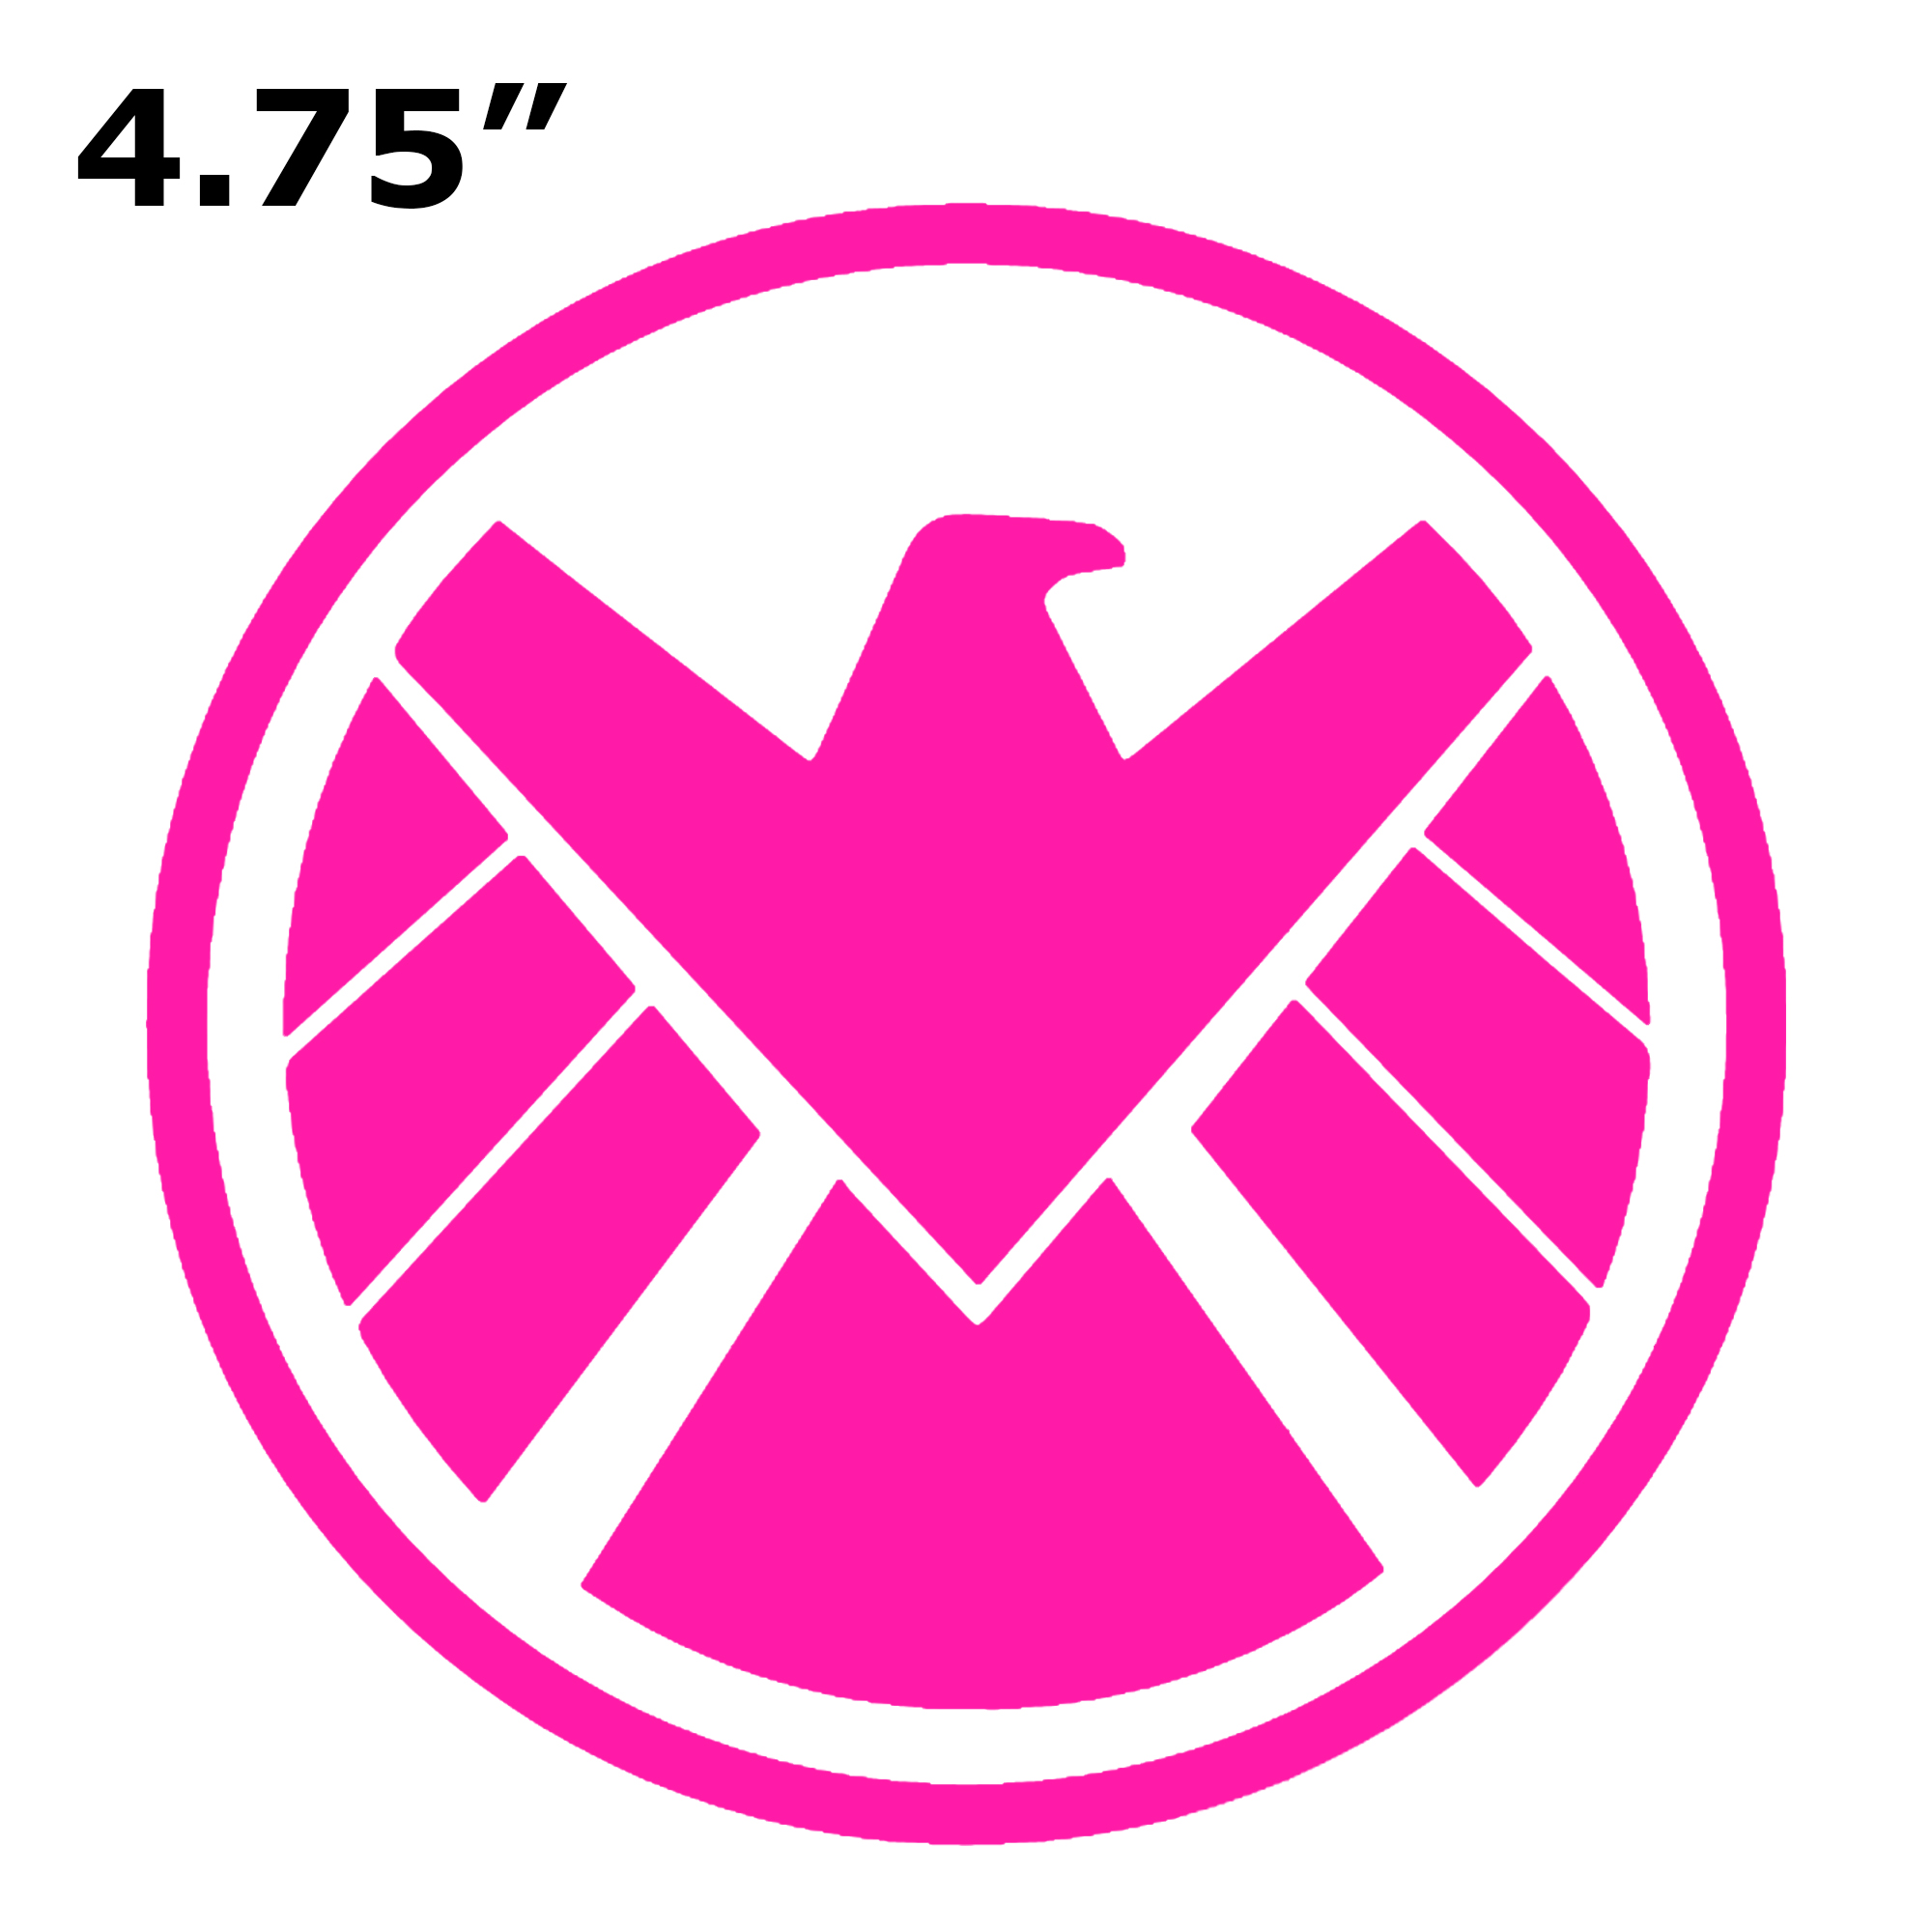 pink wonder woman logo dc comics superhero license plate made in usa